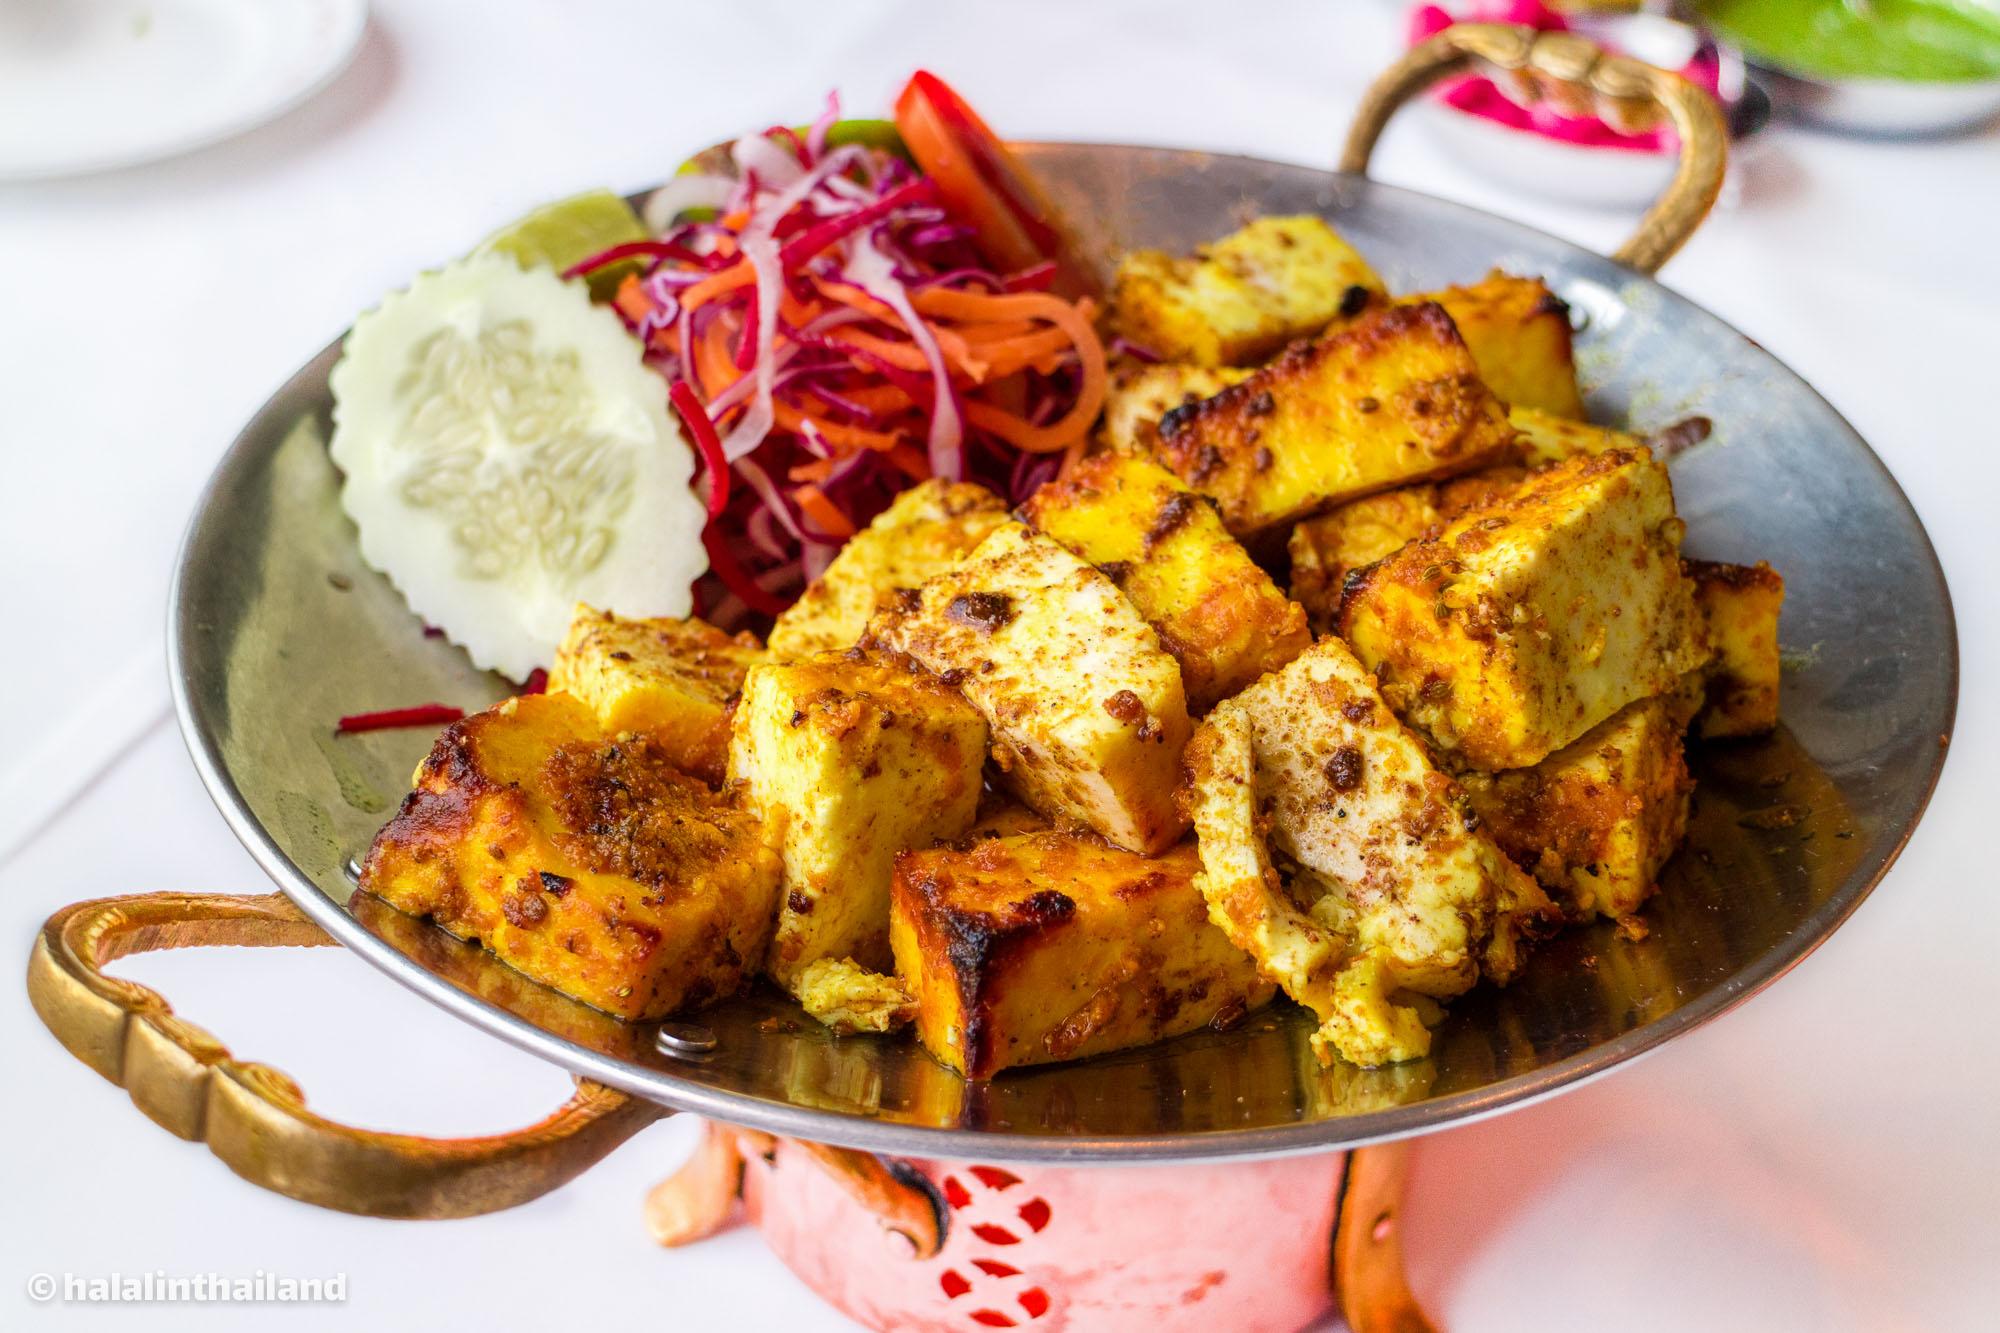 Cottage Cheese • Rang Mahal รางมาฮาล โรงแรมแรมแบรนดท์ กรุเทพฯ